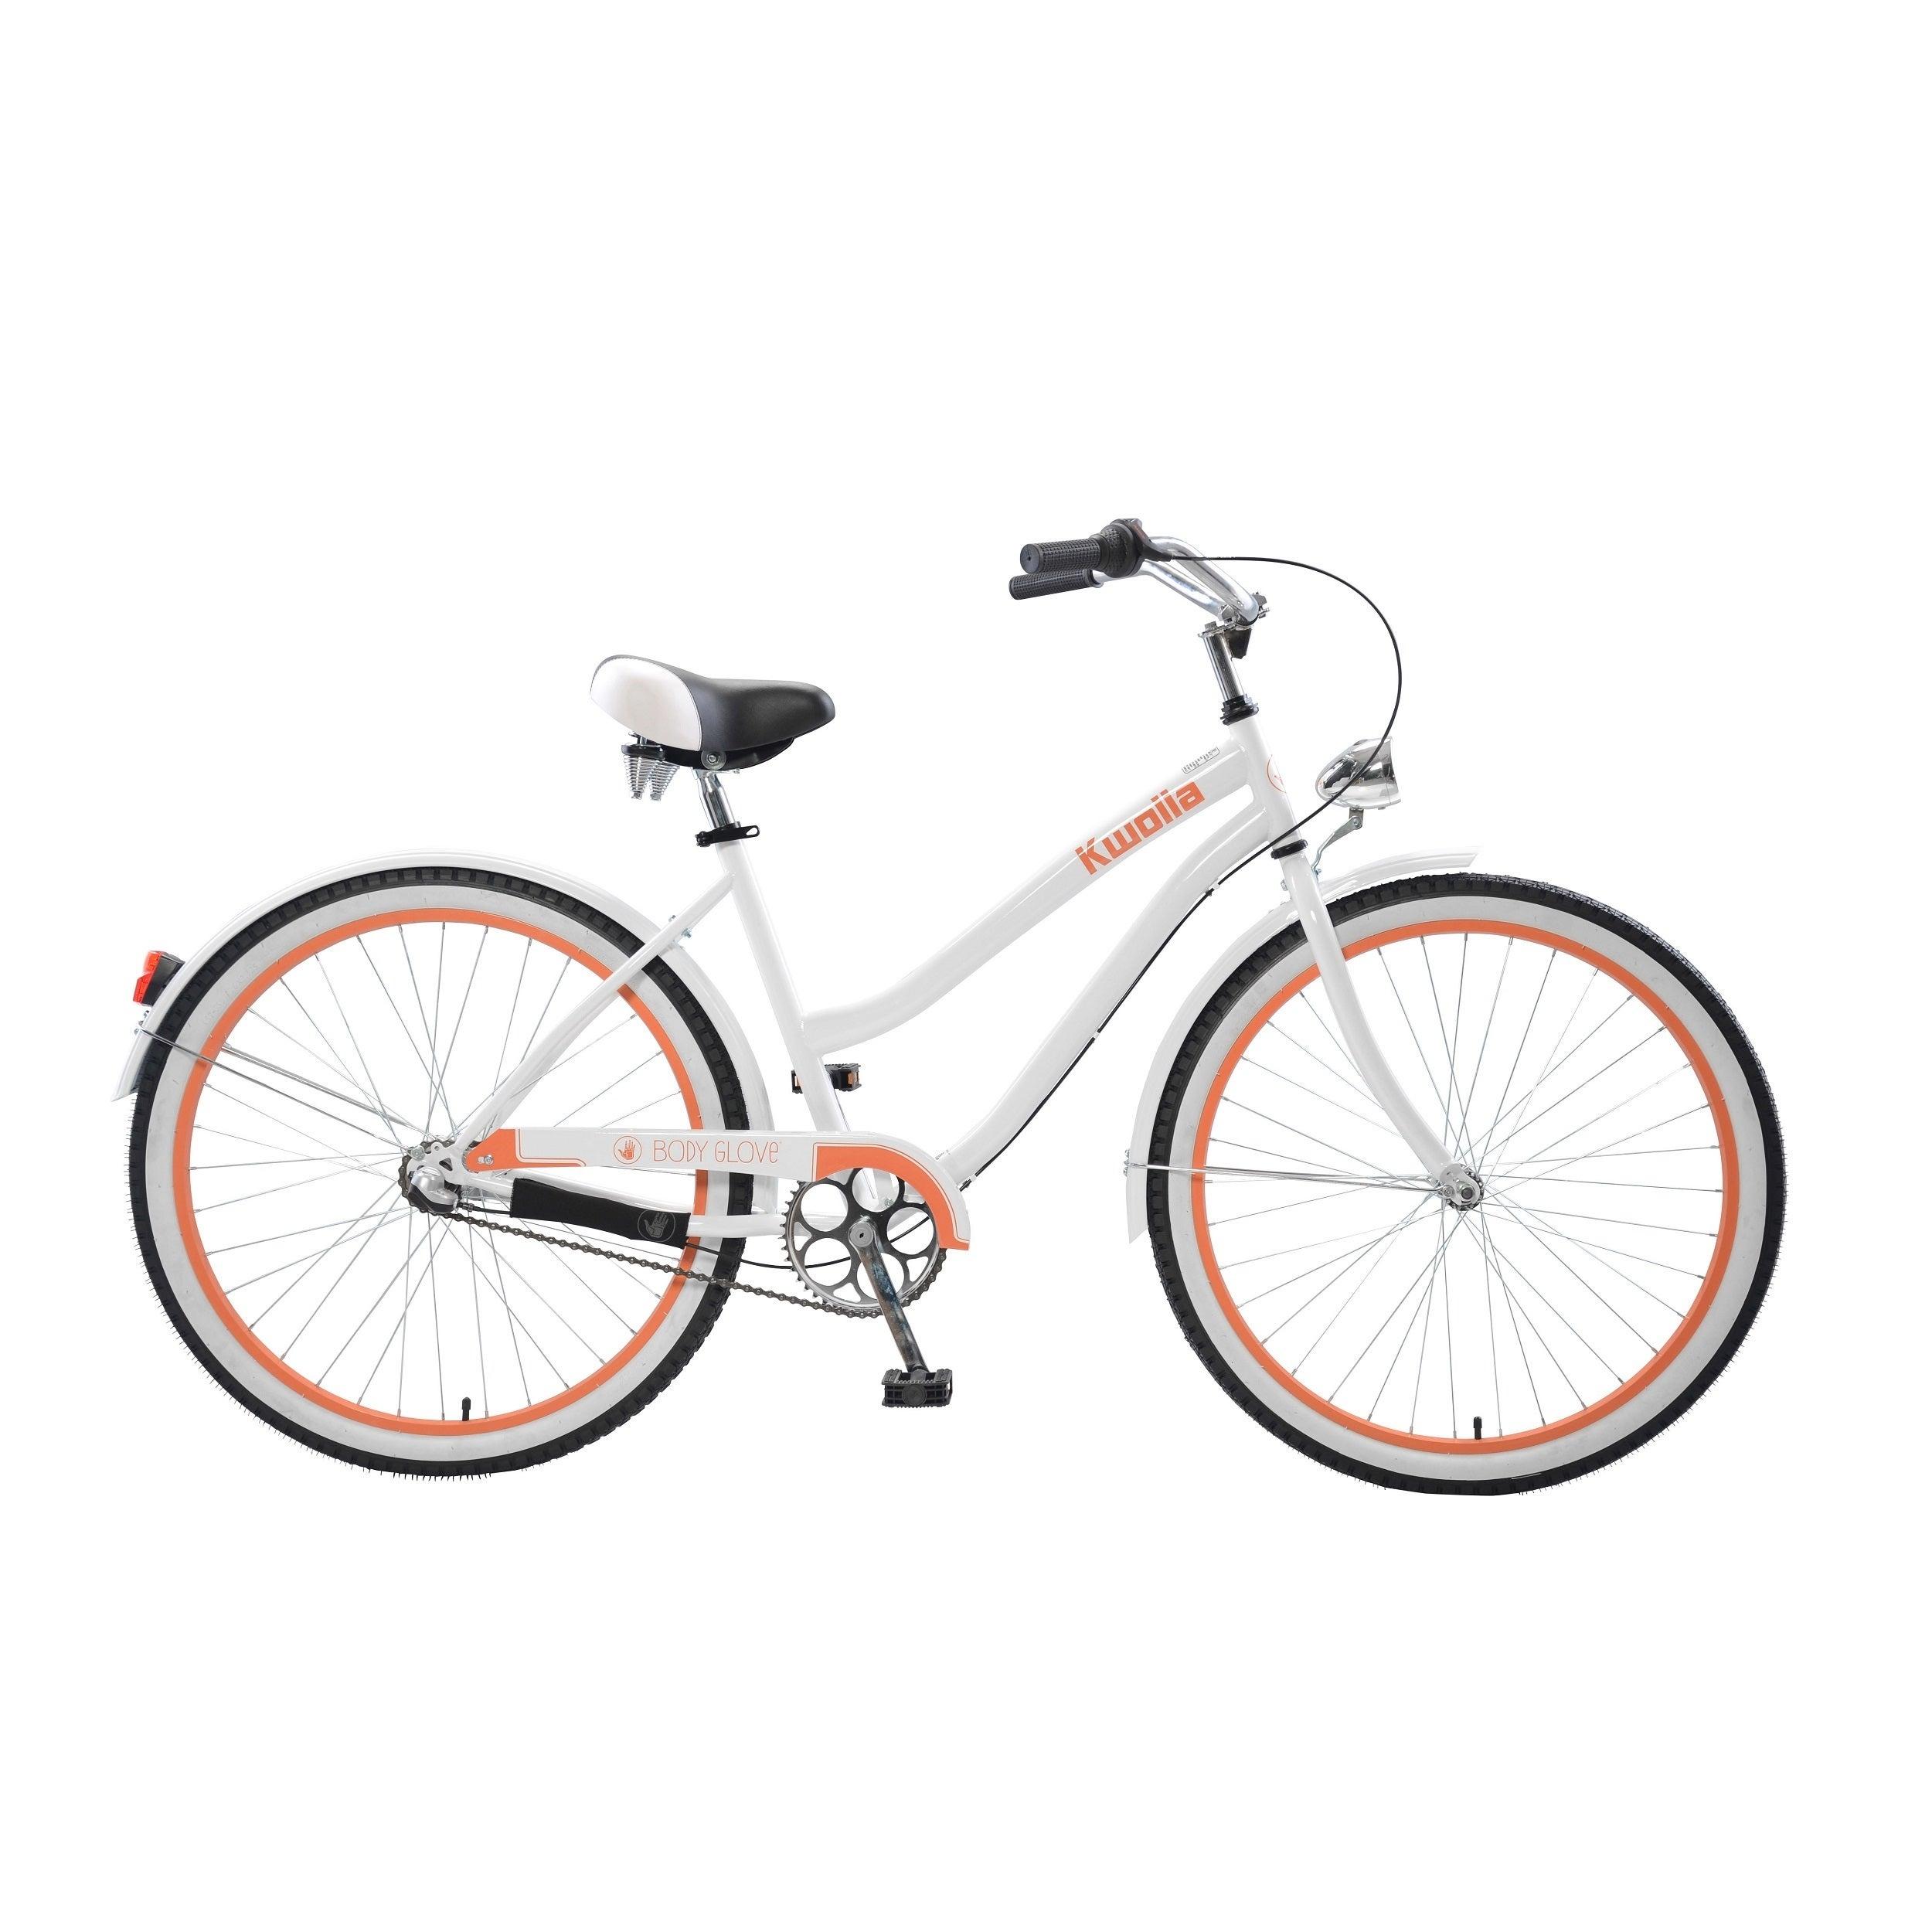 Body Glove Kwolla Cruiser Bike, 26 inch wheels, oversized frame, Women's Bike, White (White) thumbnail